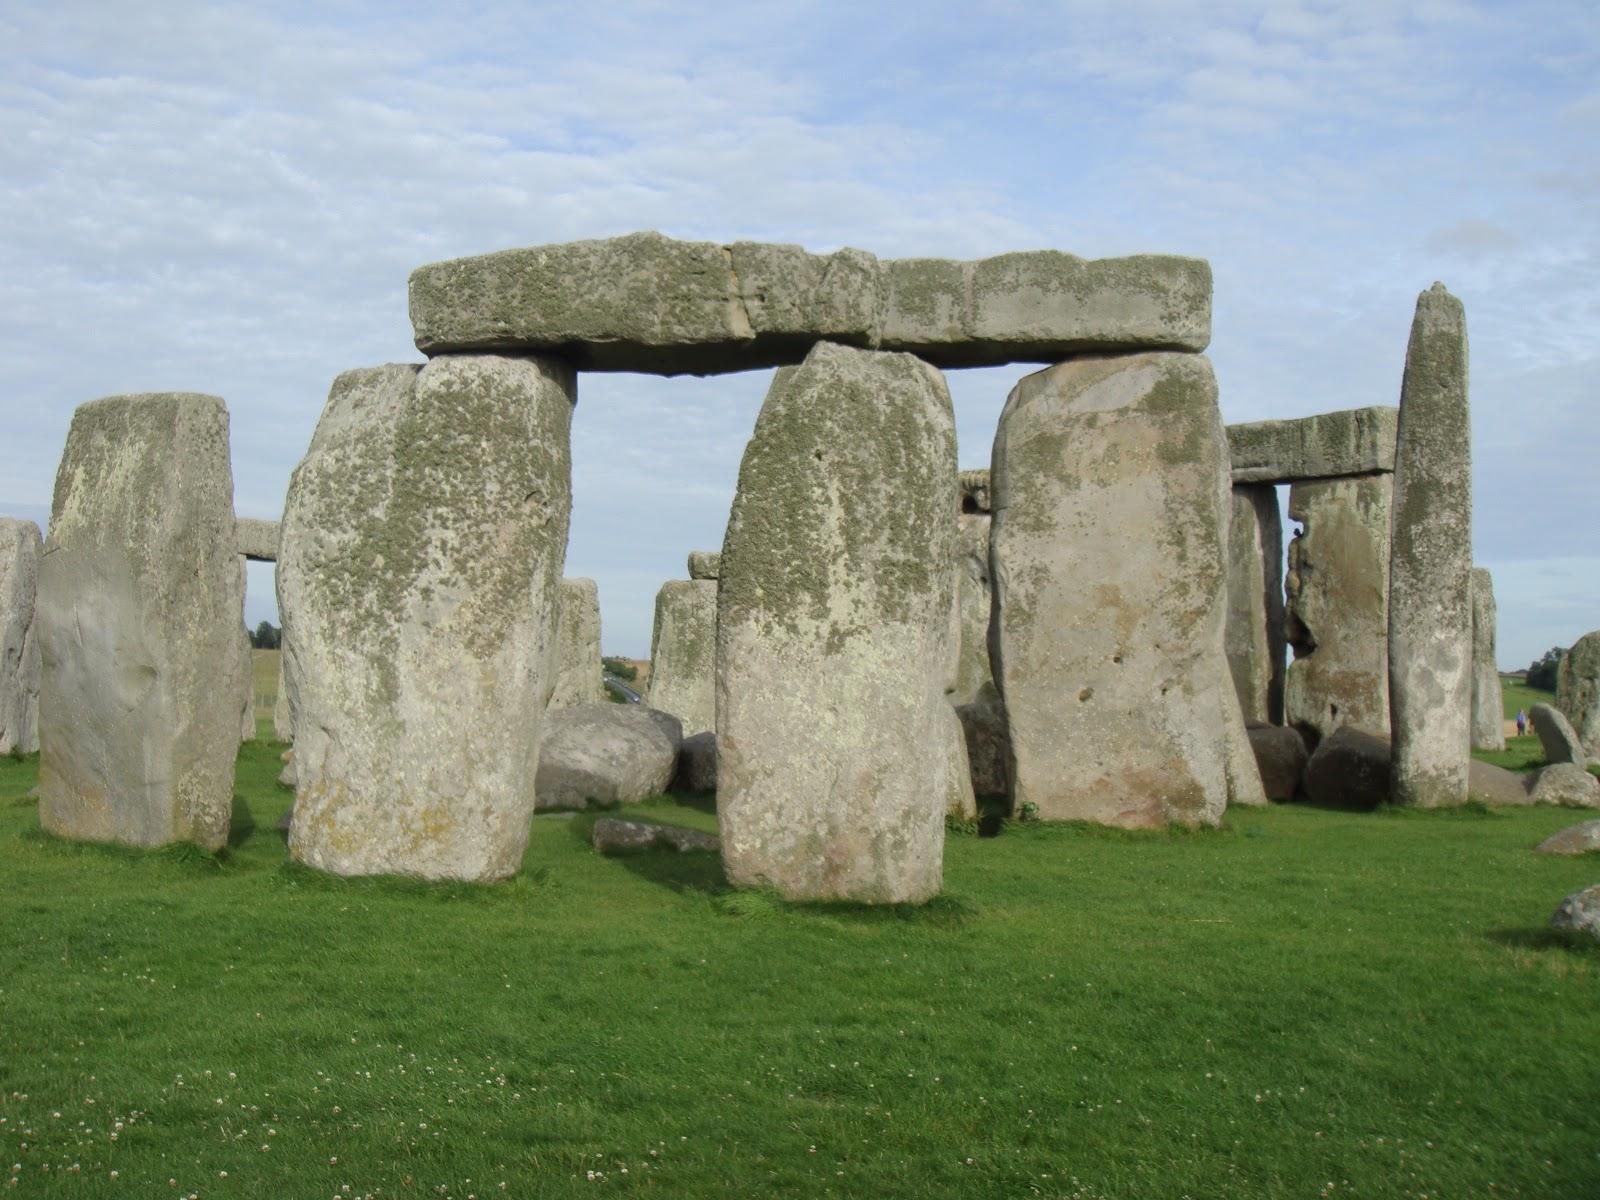 The effect axe head art at stonehenge